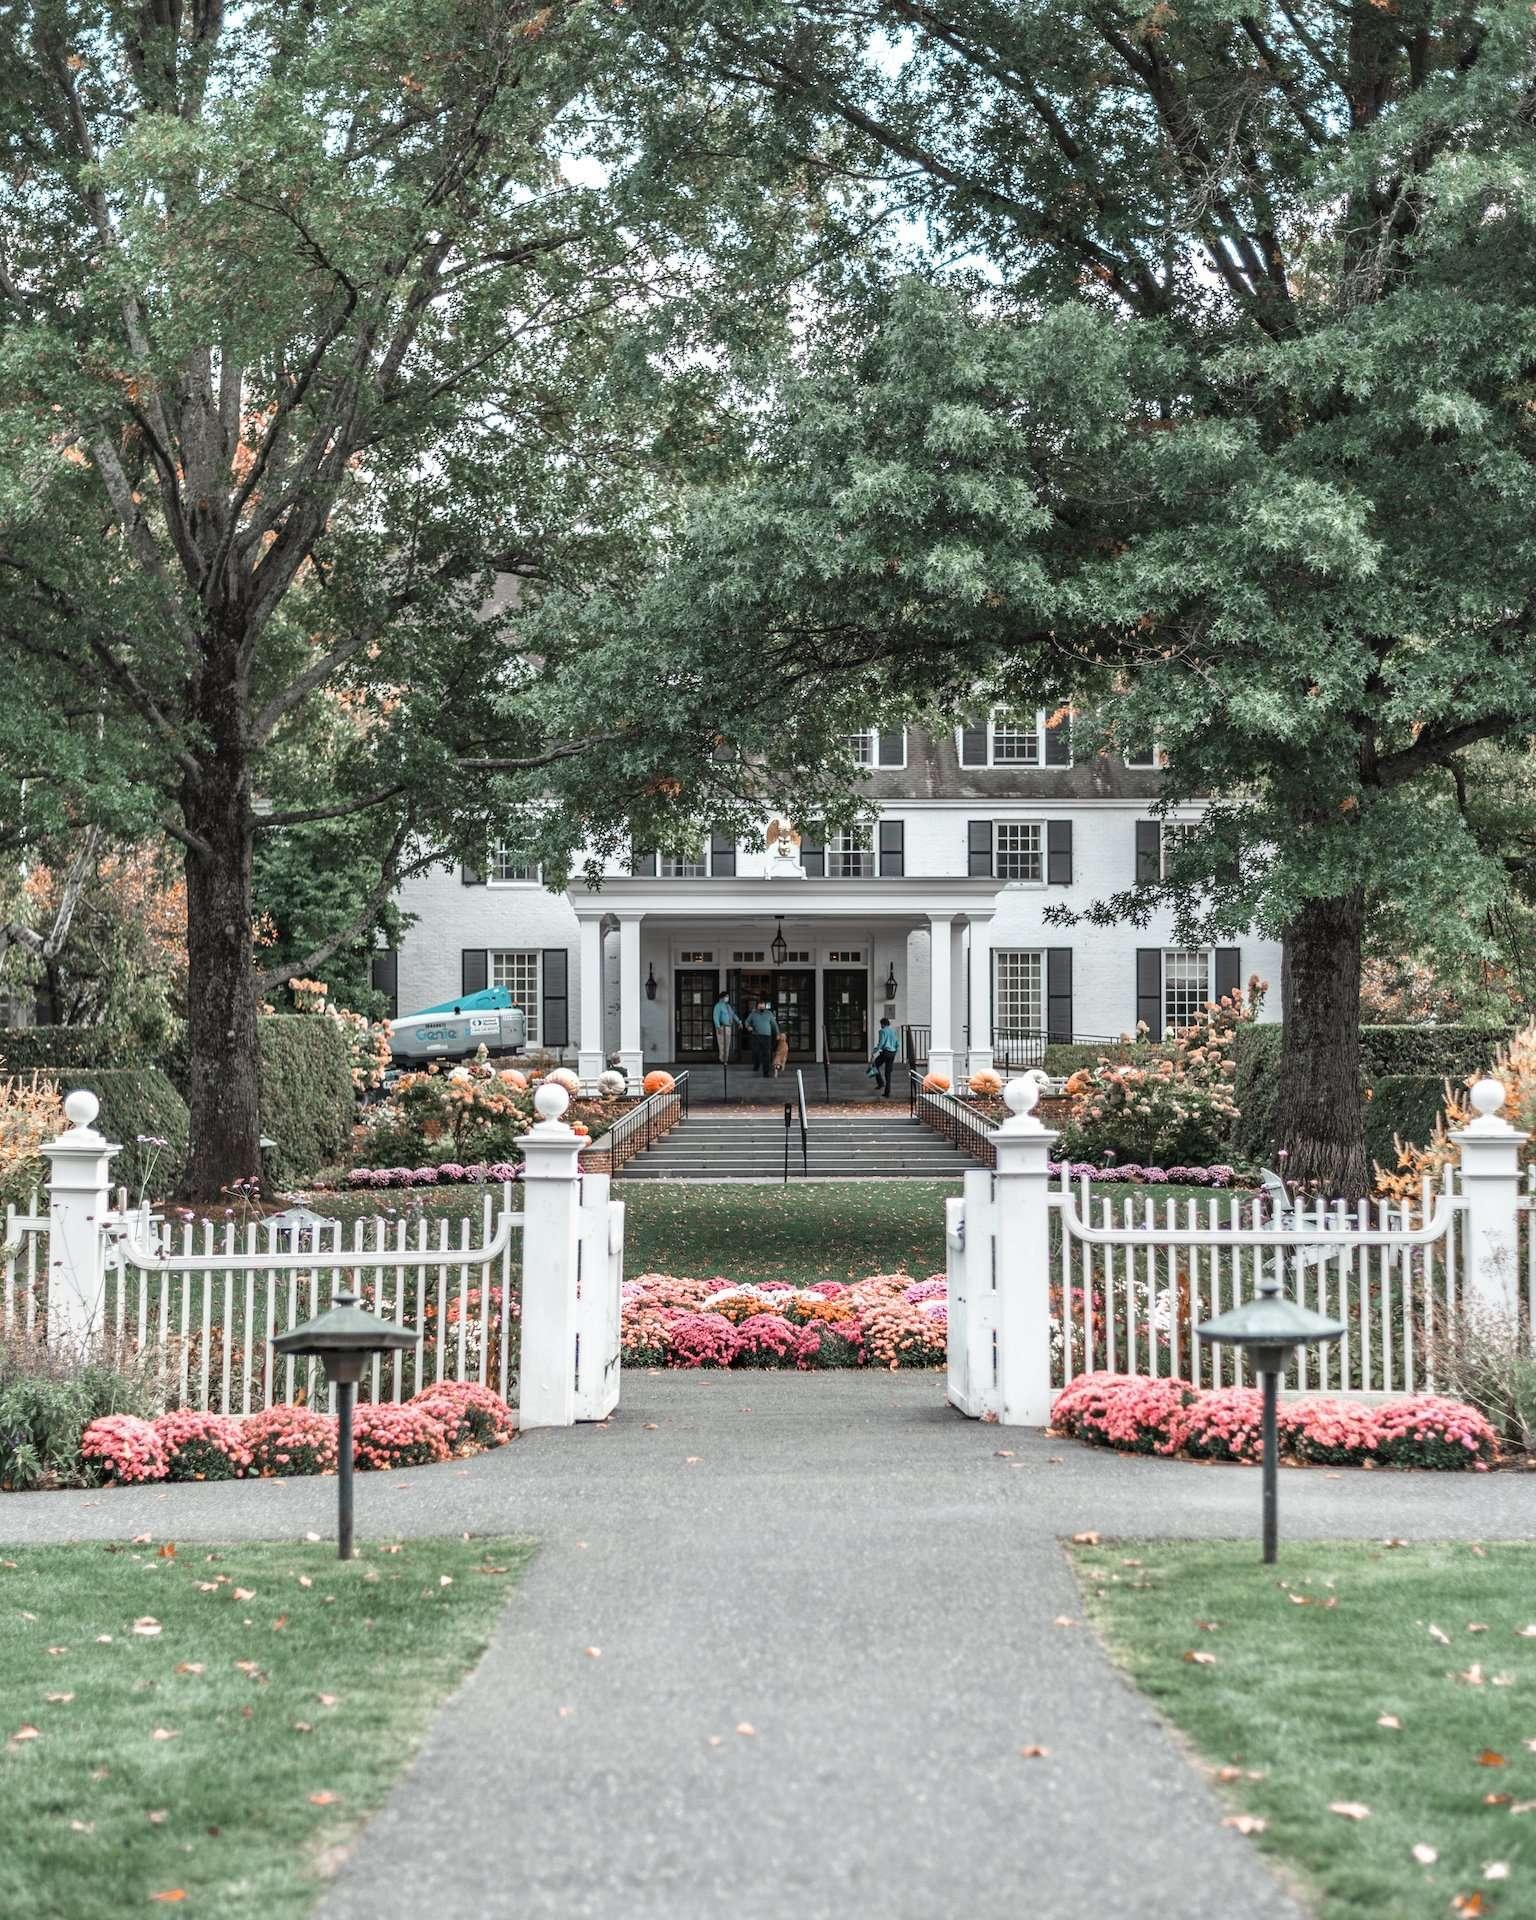 Woodstock Inn & Resort Entranceway